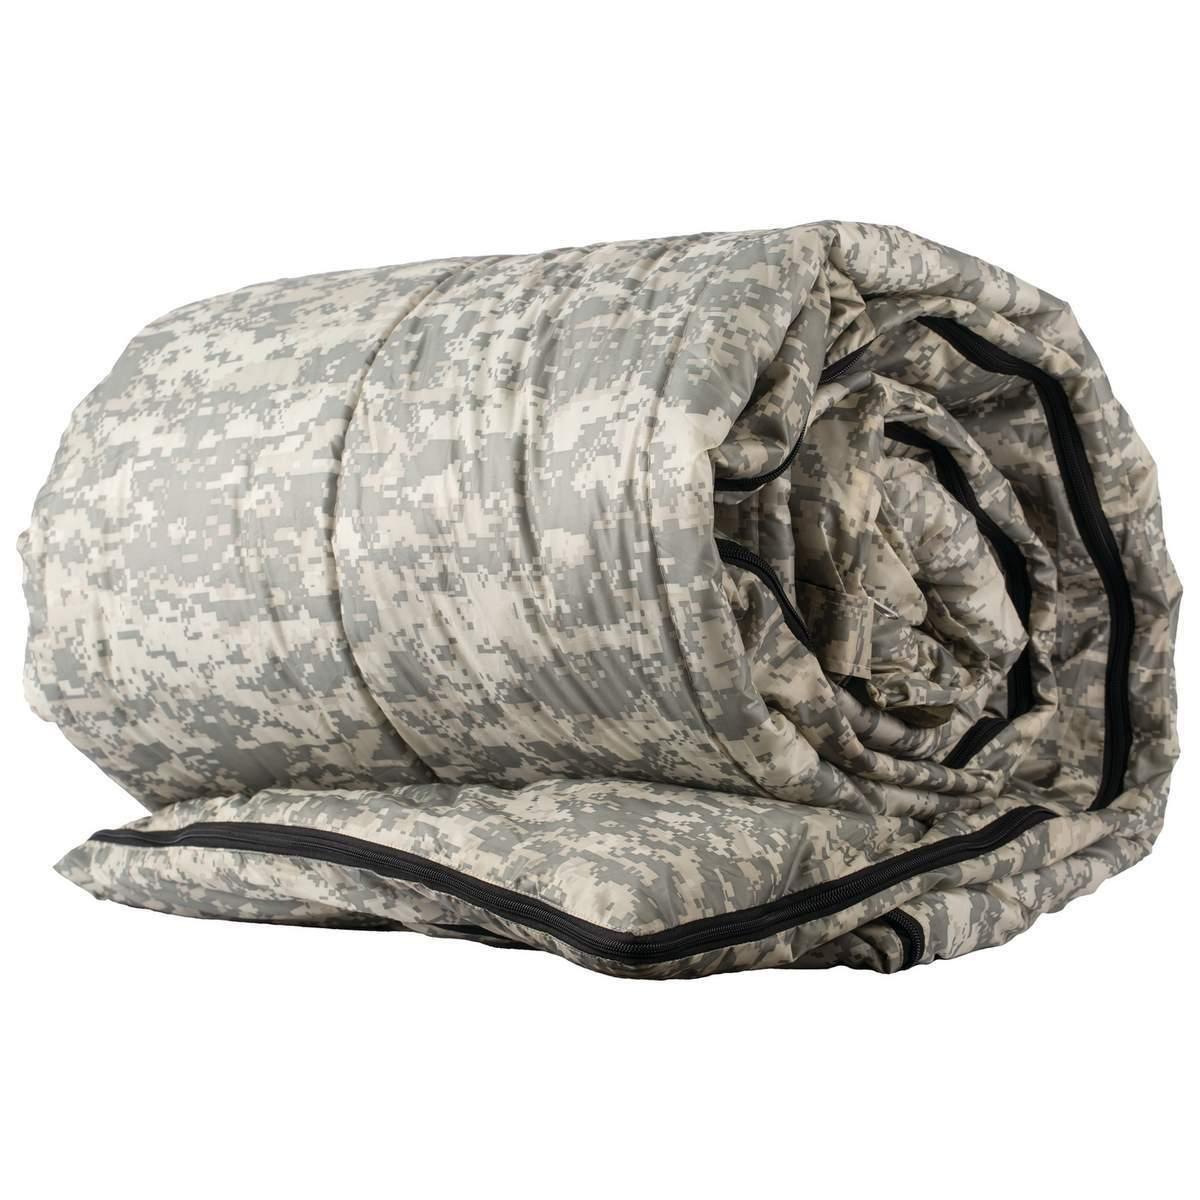 Queen Size Sleeping Bag –  Digital Camo  fashionable